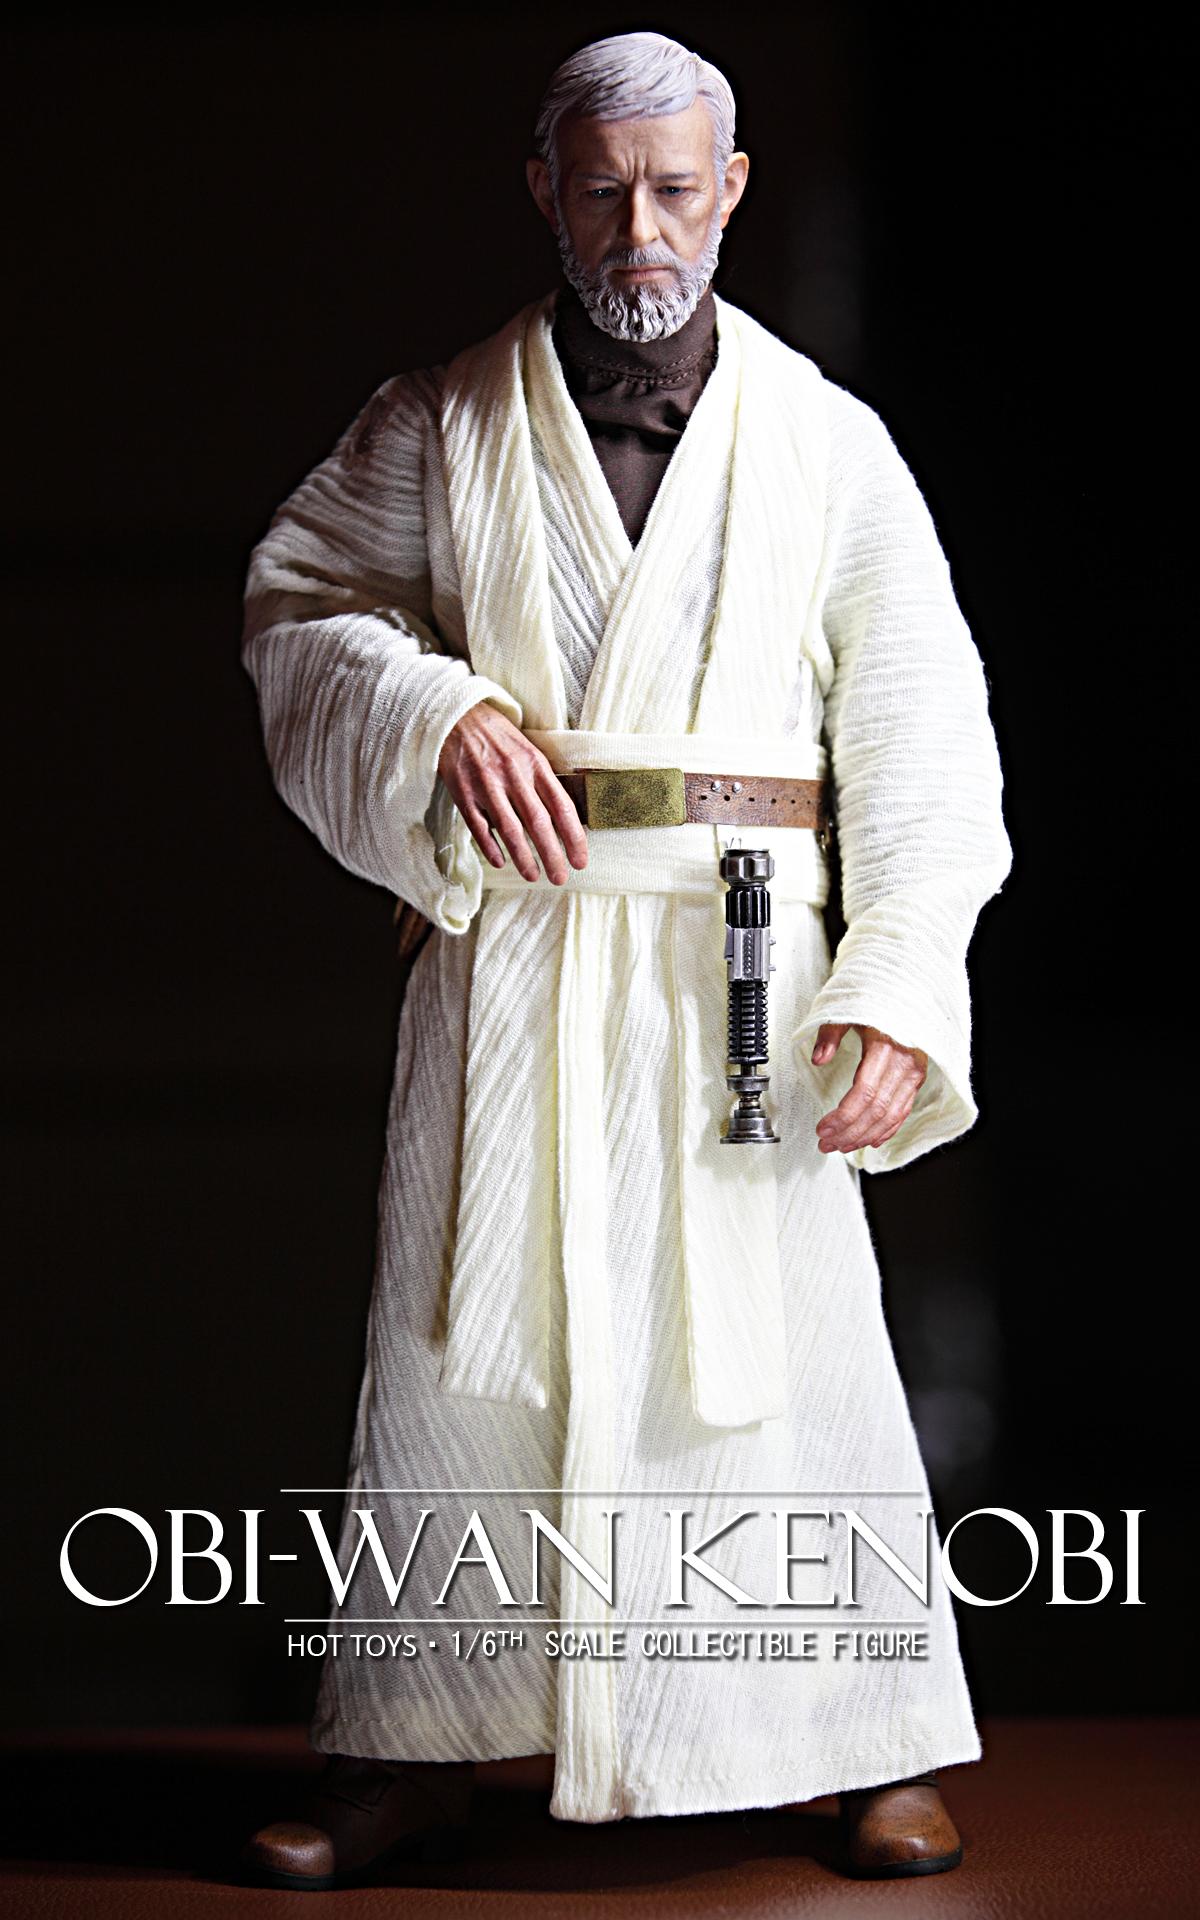 hottoys-star-wars-episode-IV-a-new-hope-obi-wan-kenobi-picture05